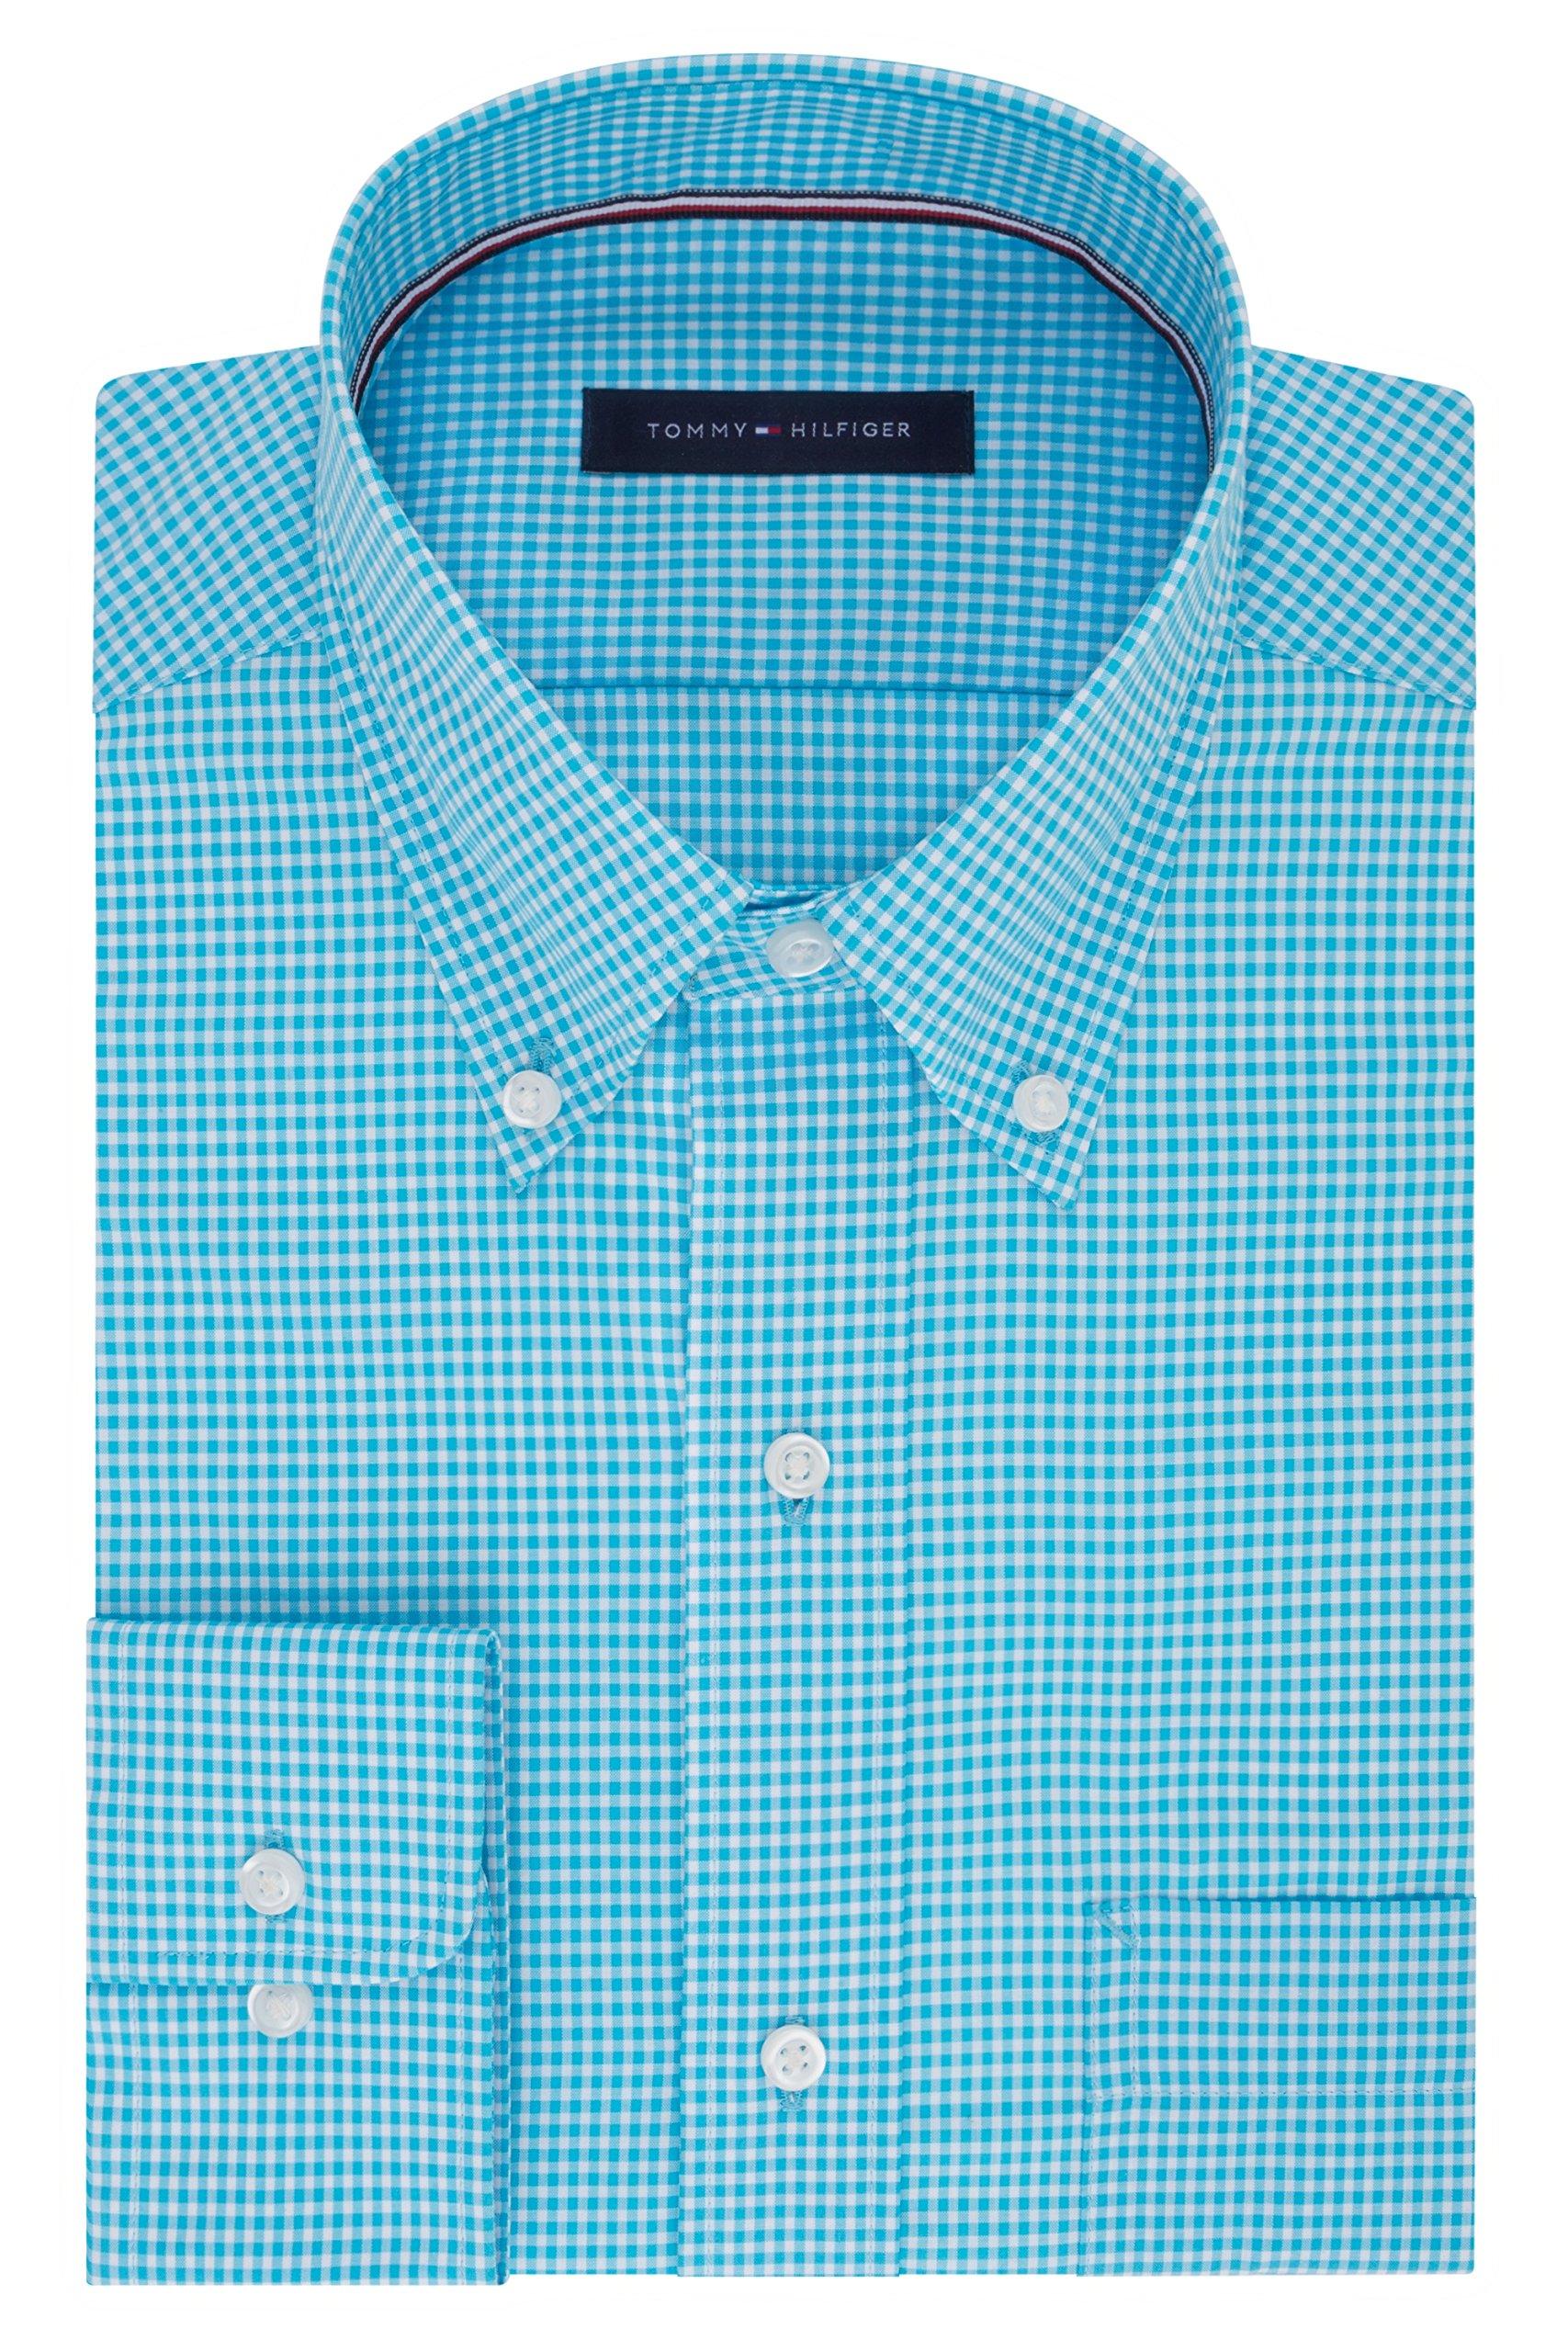 Tommy Hilfiger Men's Big and Tall Long Button Down Shirt, Aqua, 18'' Neck 34''-35'' Sleeve